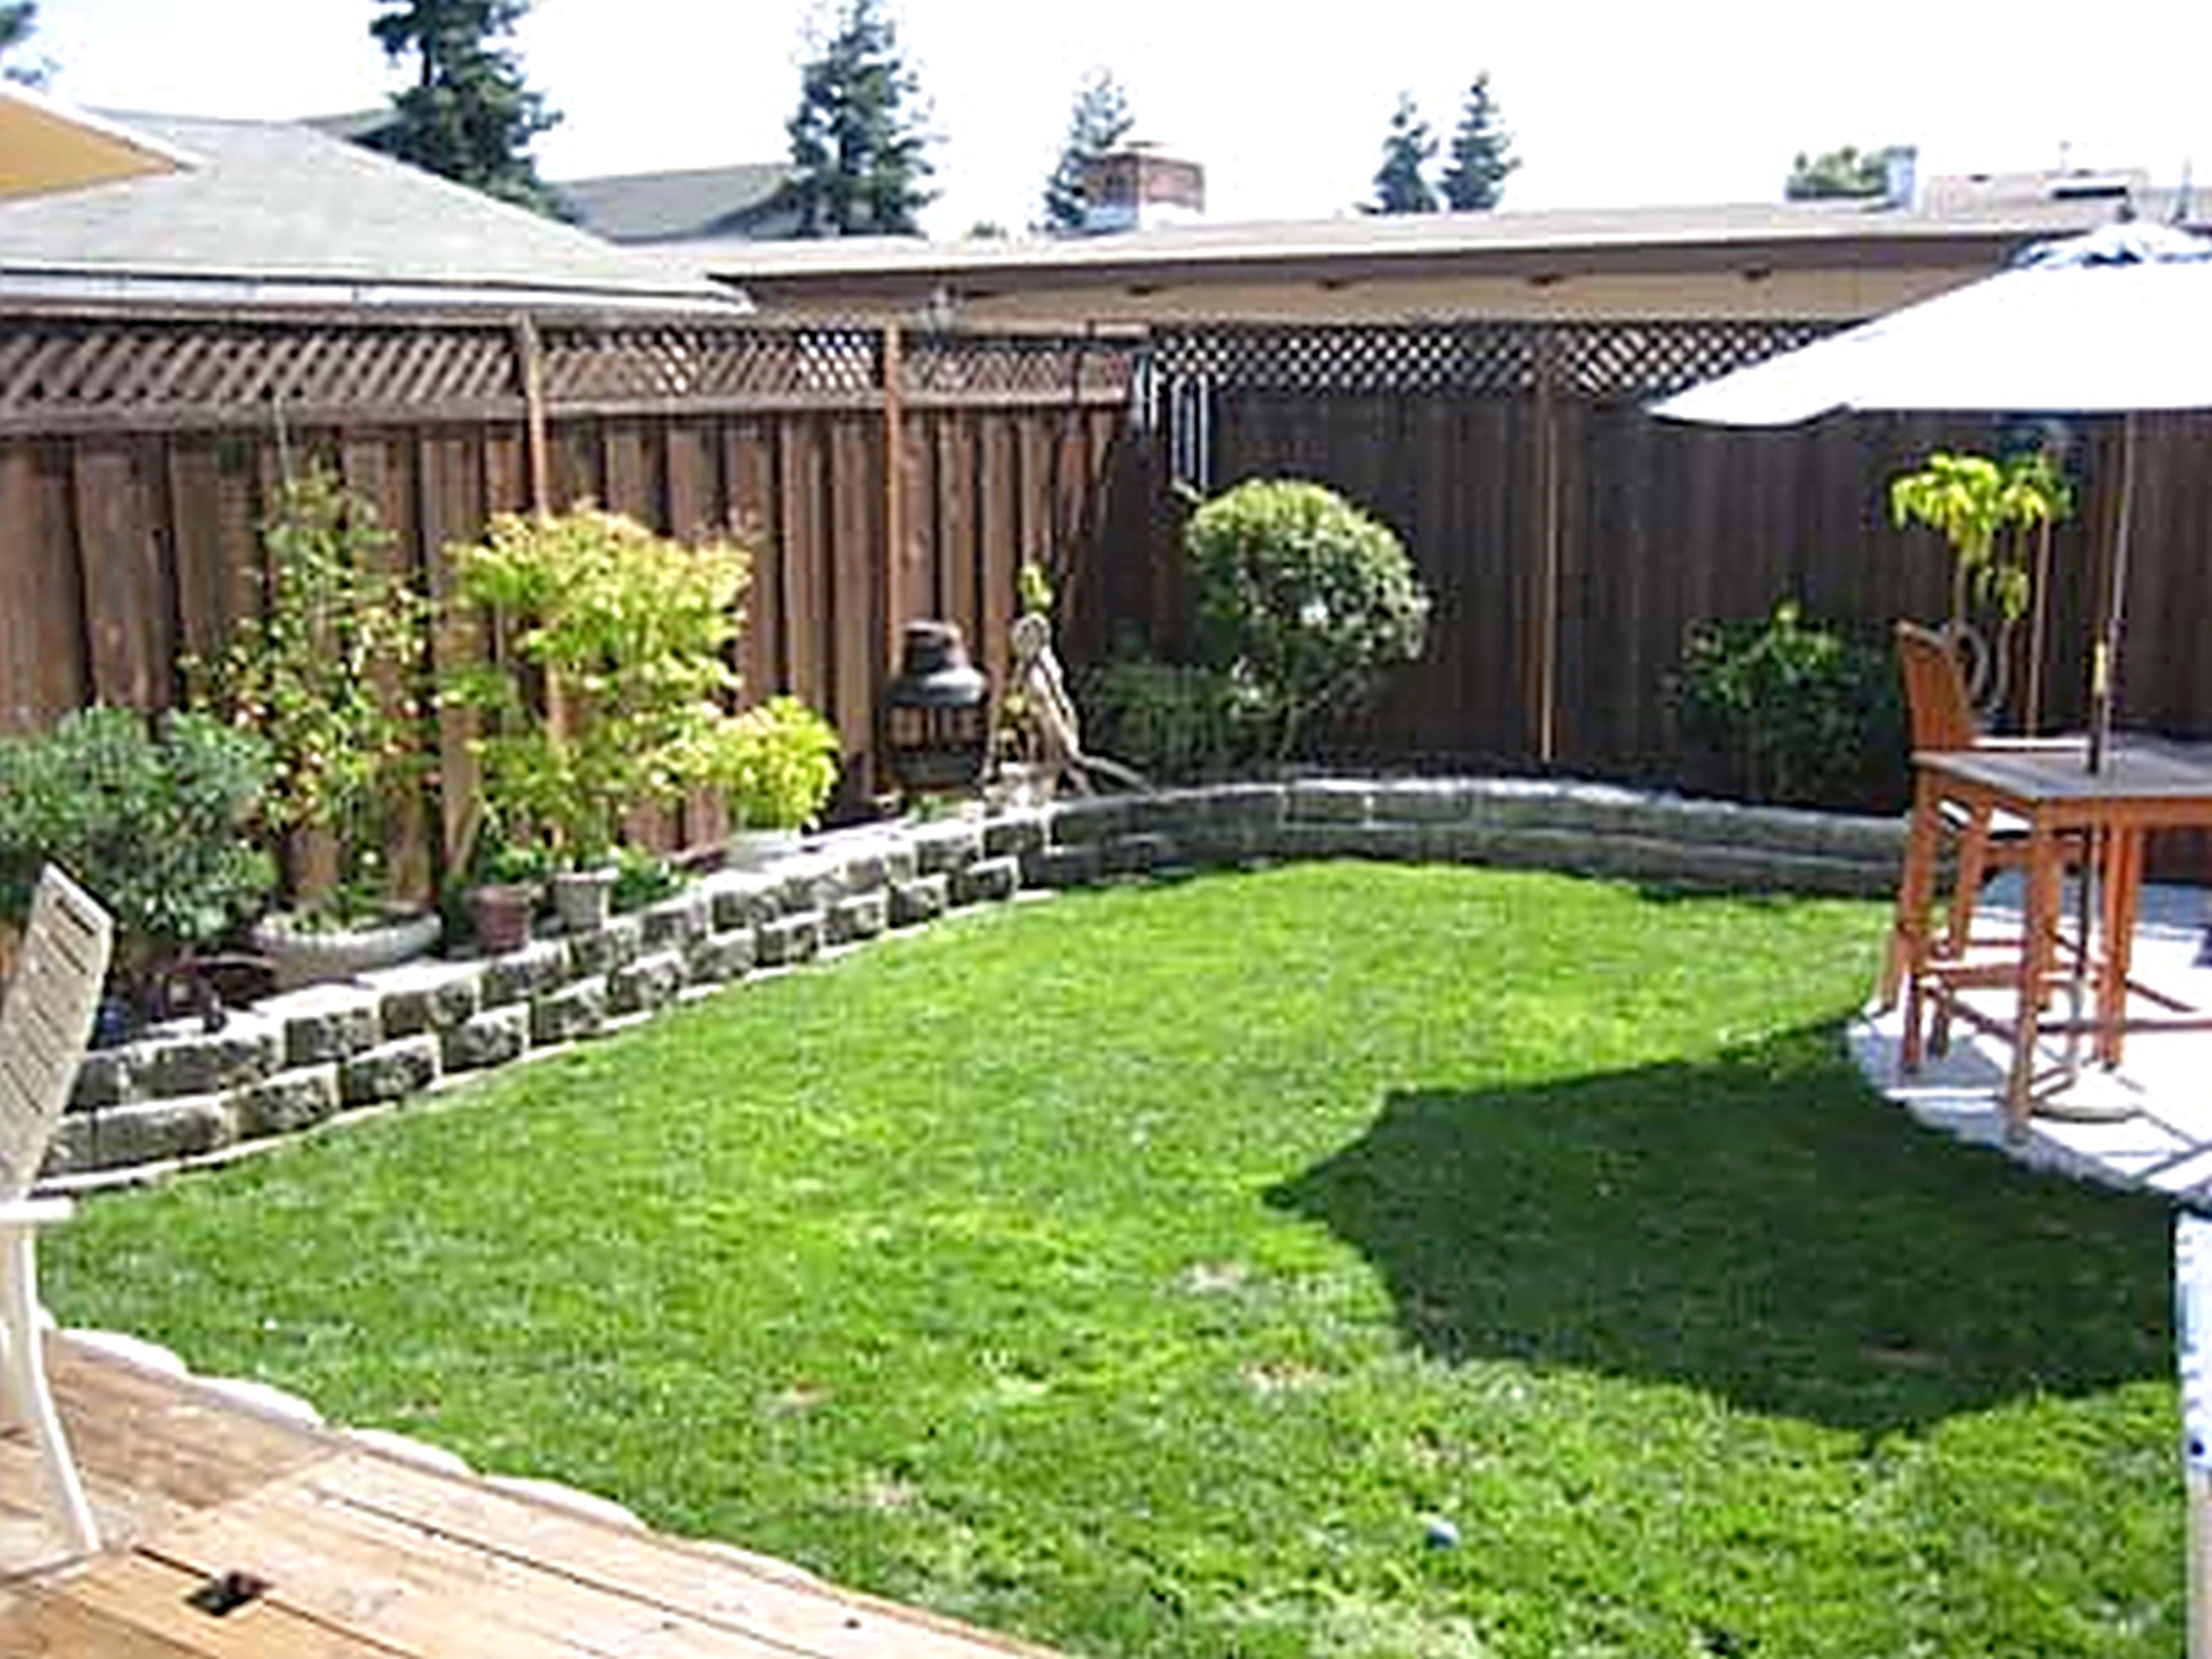 Best 40 Incredible Landscape Design Ideas For You Front Yard Or Backyard Https Freshouz Com 40 Inc Backyard Remodel Easy Backyard Small Backyard Landscaping